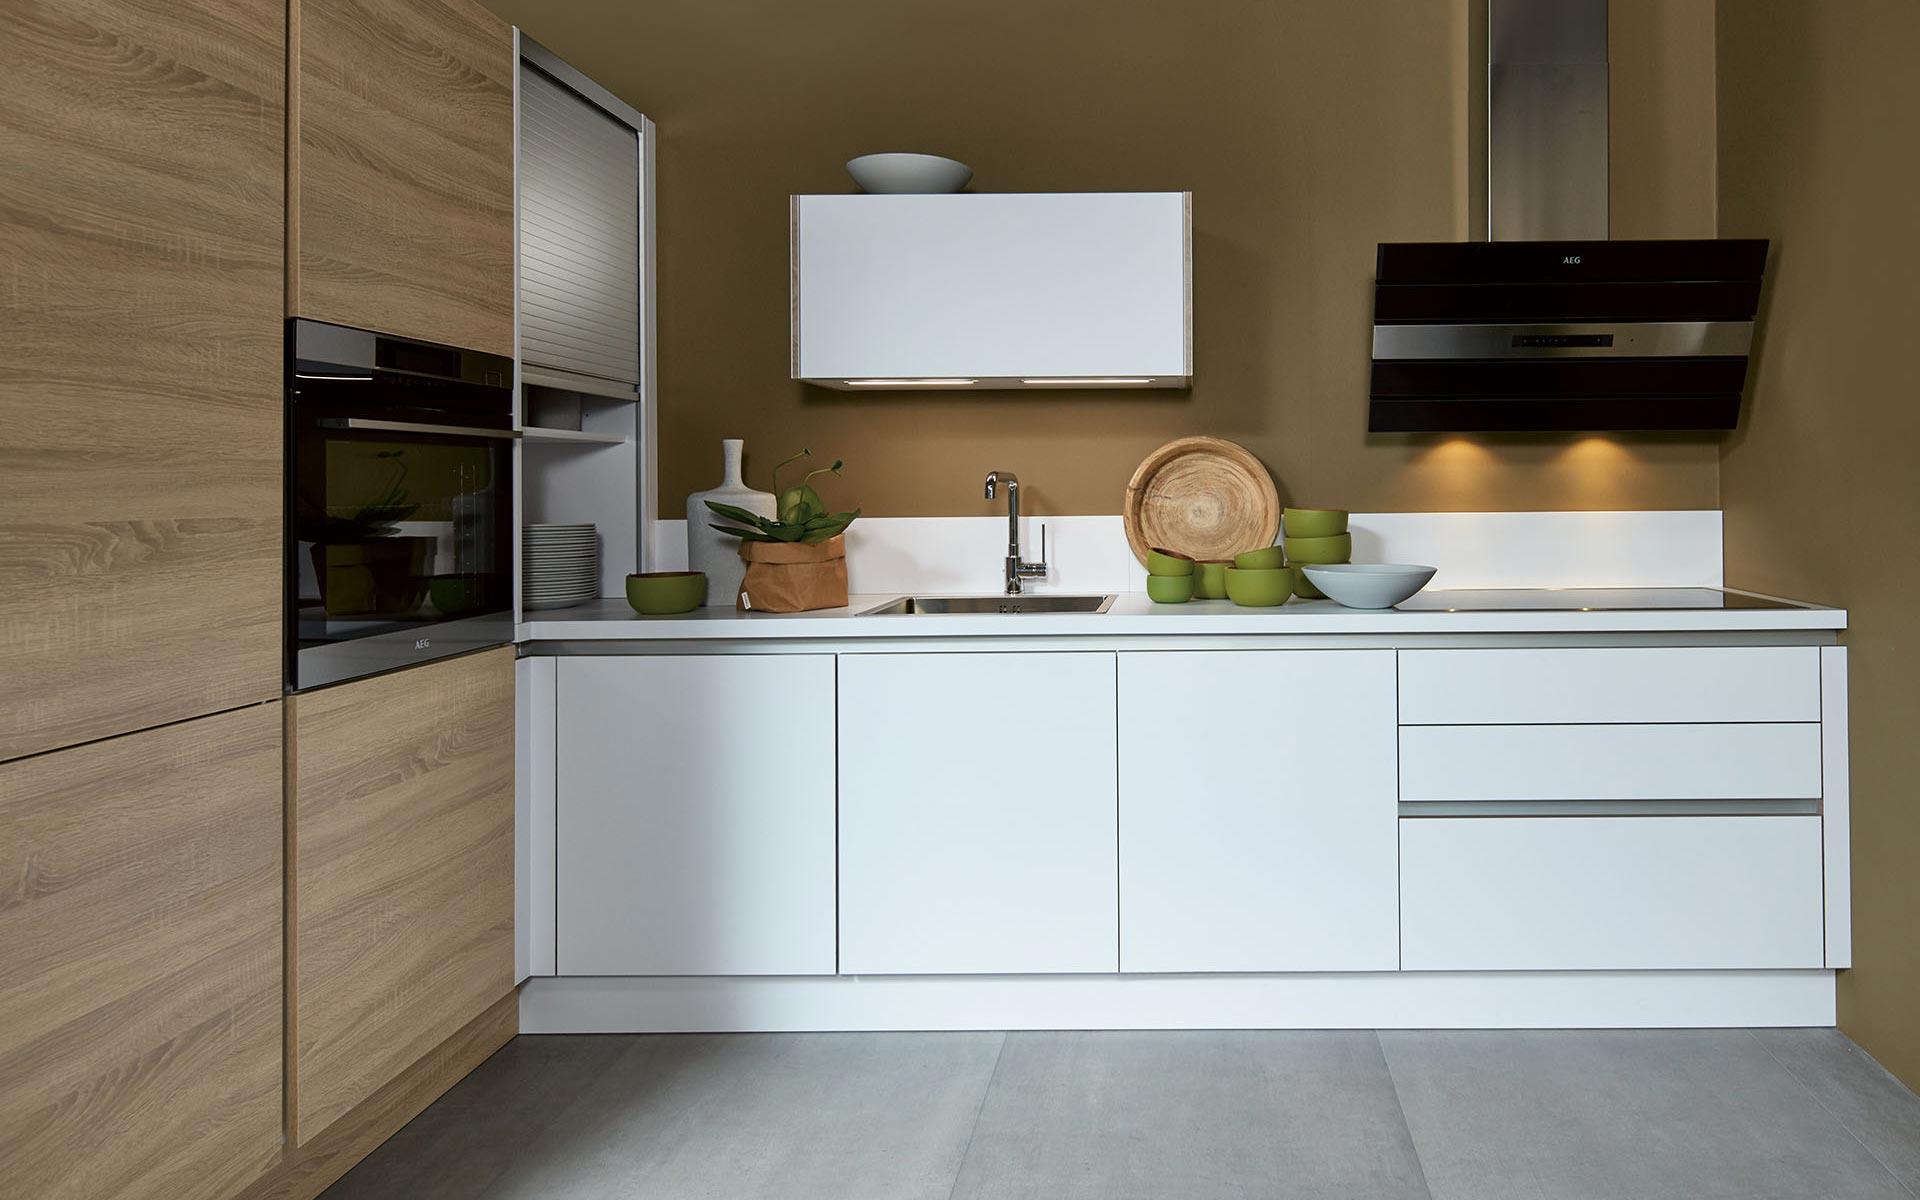 Toronto: Kitchens from Germany, Europe. Porto H Woodline Eiche Bardolino • Style Touth Optiwhite